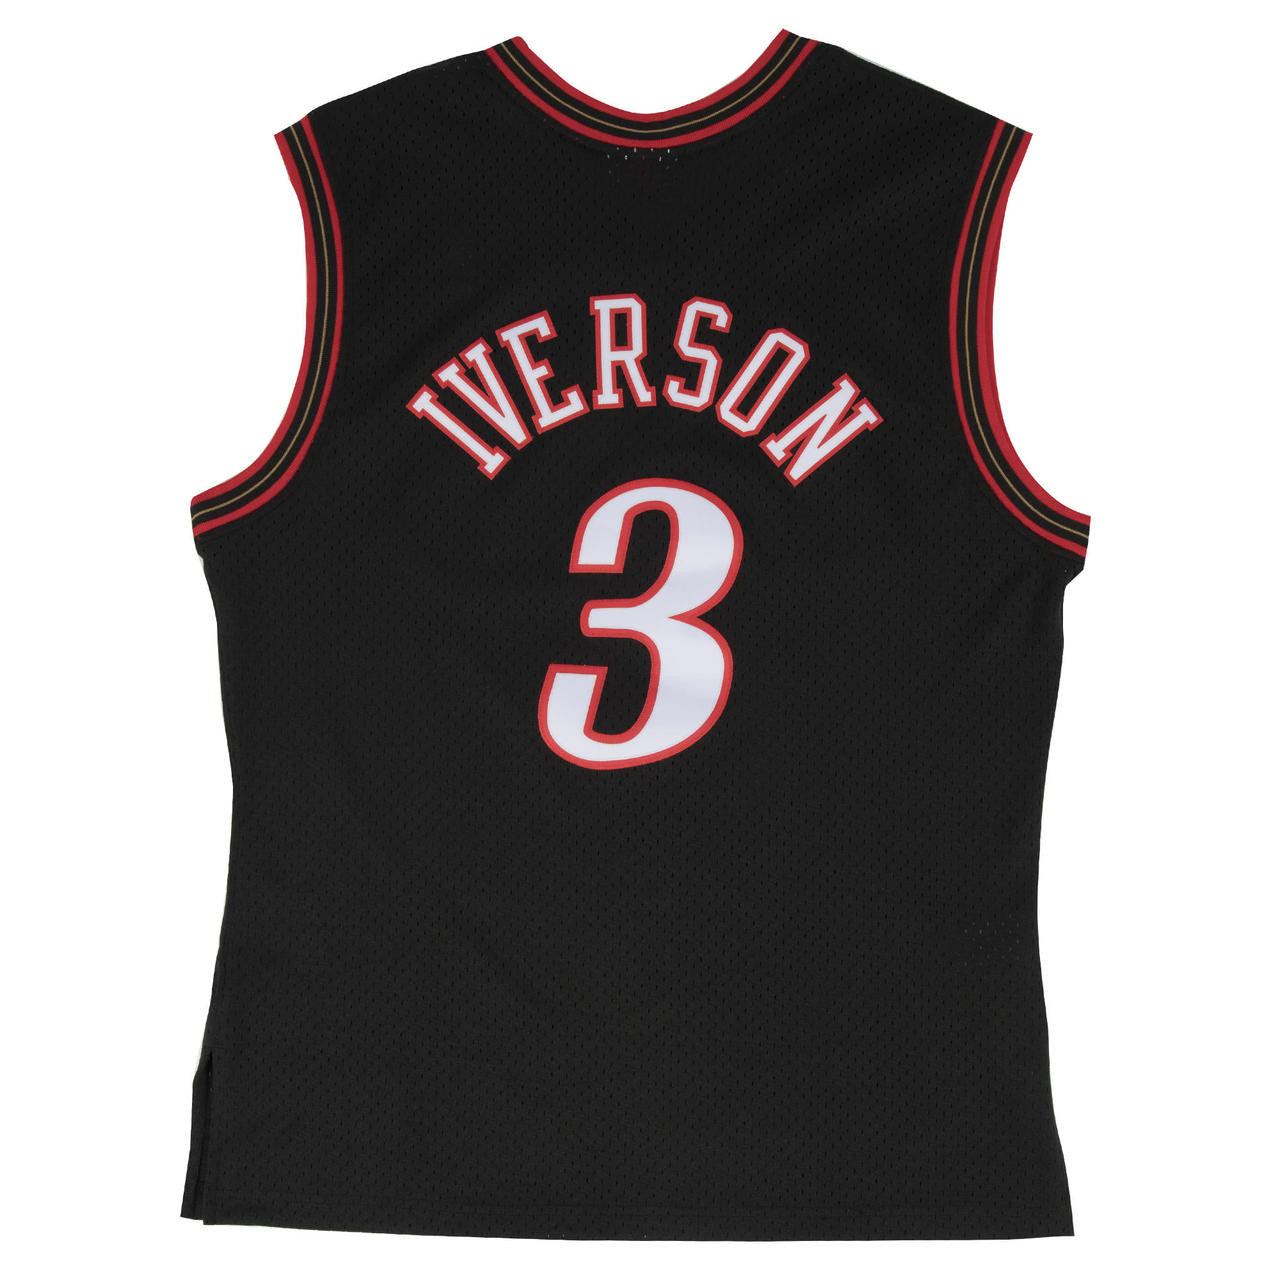 61da95ac4ad Allen Iverson Philadelphia 76ers Mitchell   Ness 2000-01 Hardwood ...